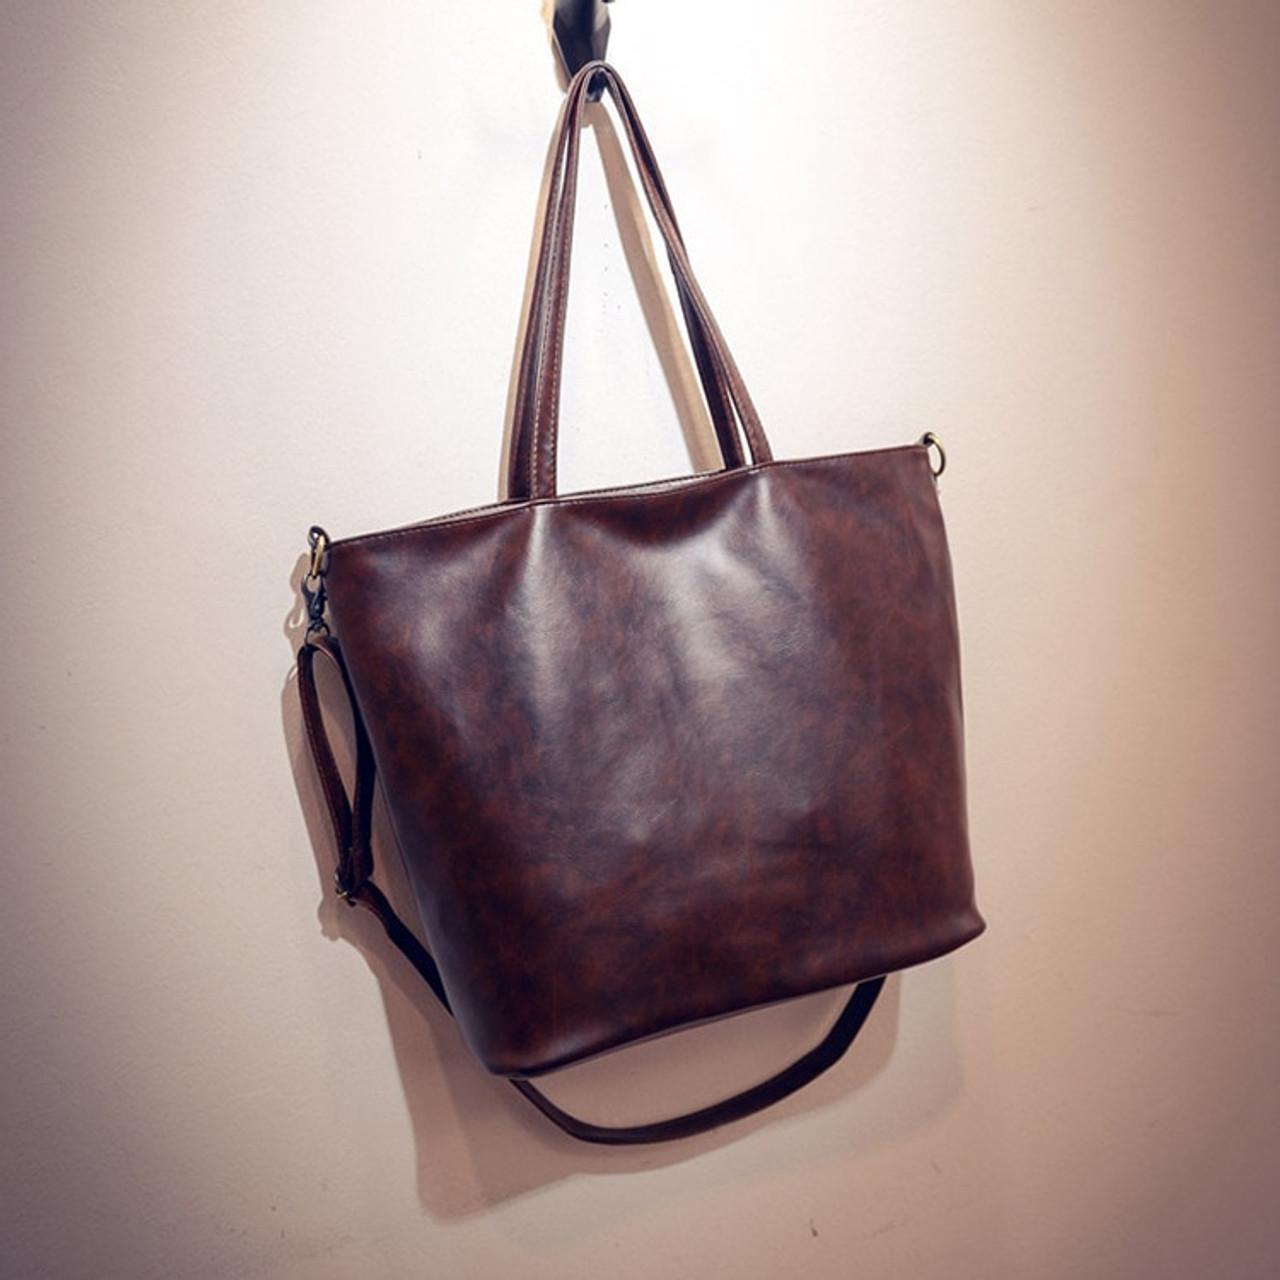 1127e6085b113 ... Fashion Tote Women PU Leather Handbag Casual Style Big Tote Bag High  Quality Female Large Shoulder ...